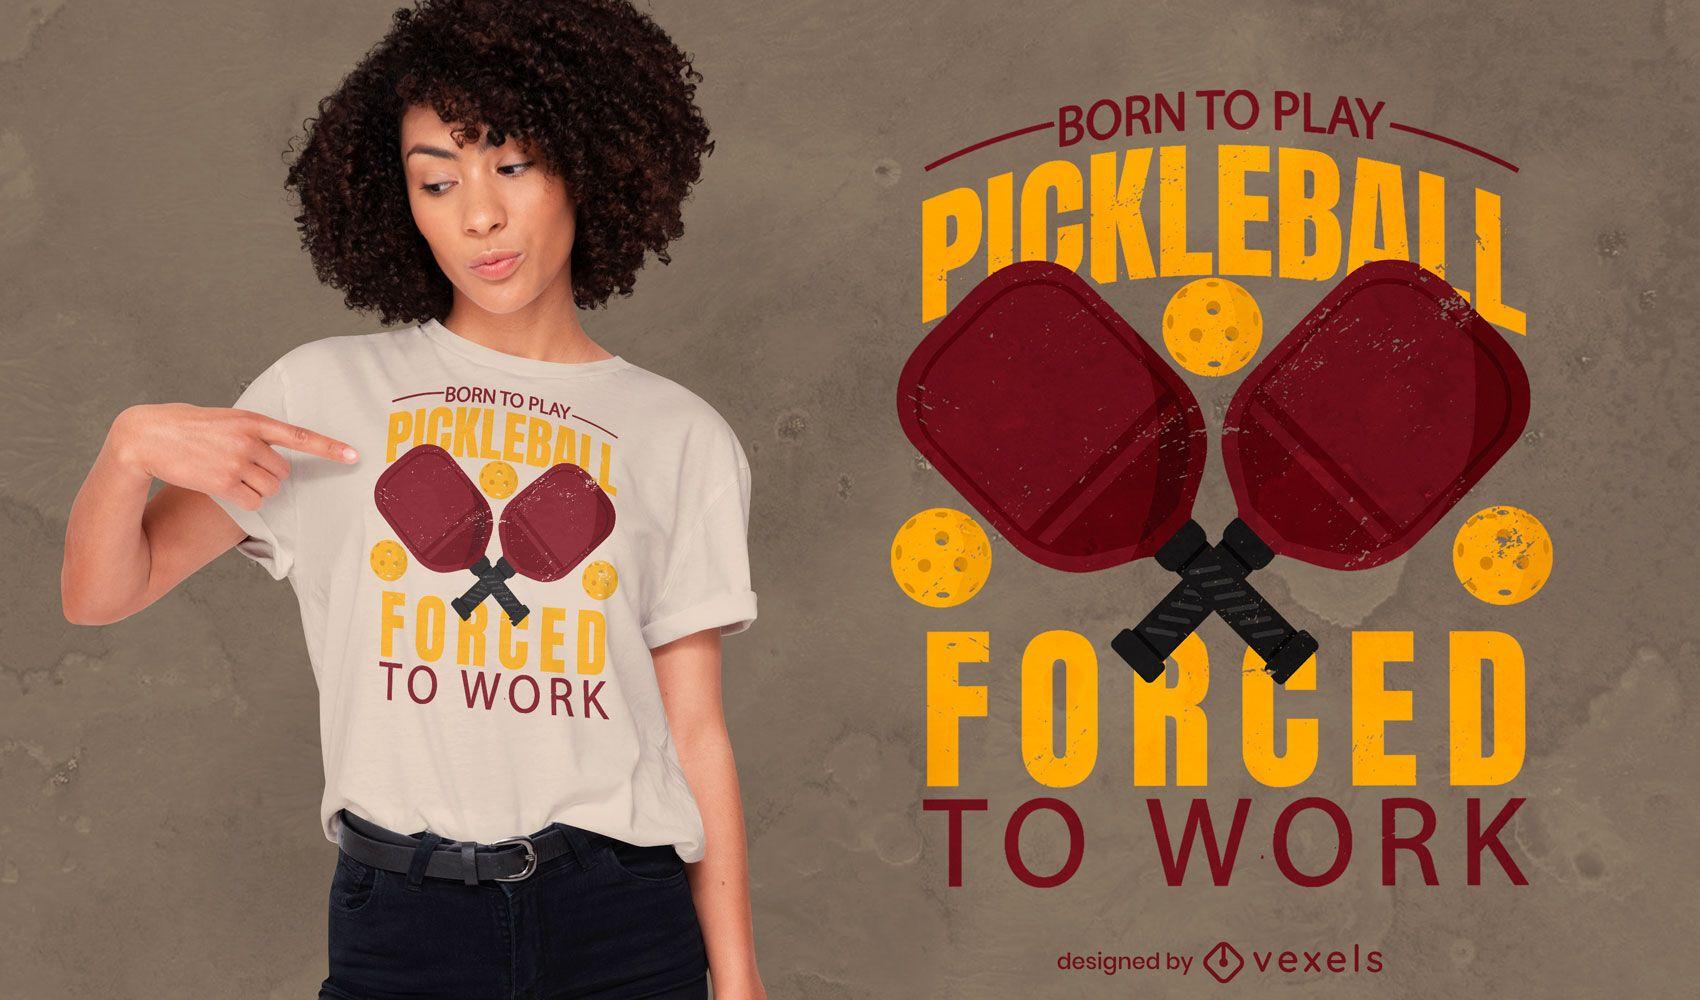 Diseño de camiseta con cita deportiva de pickleball